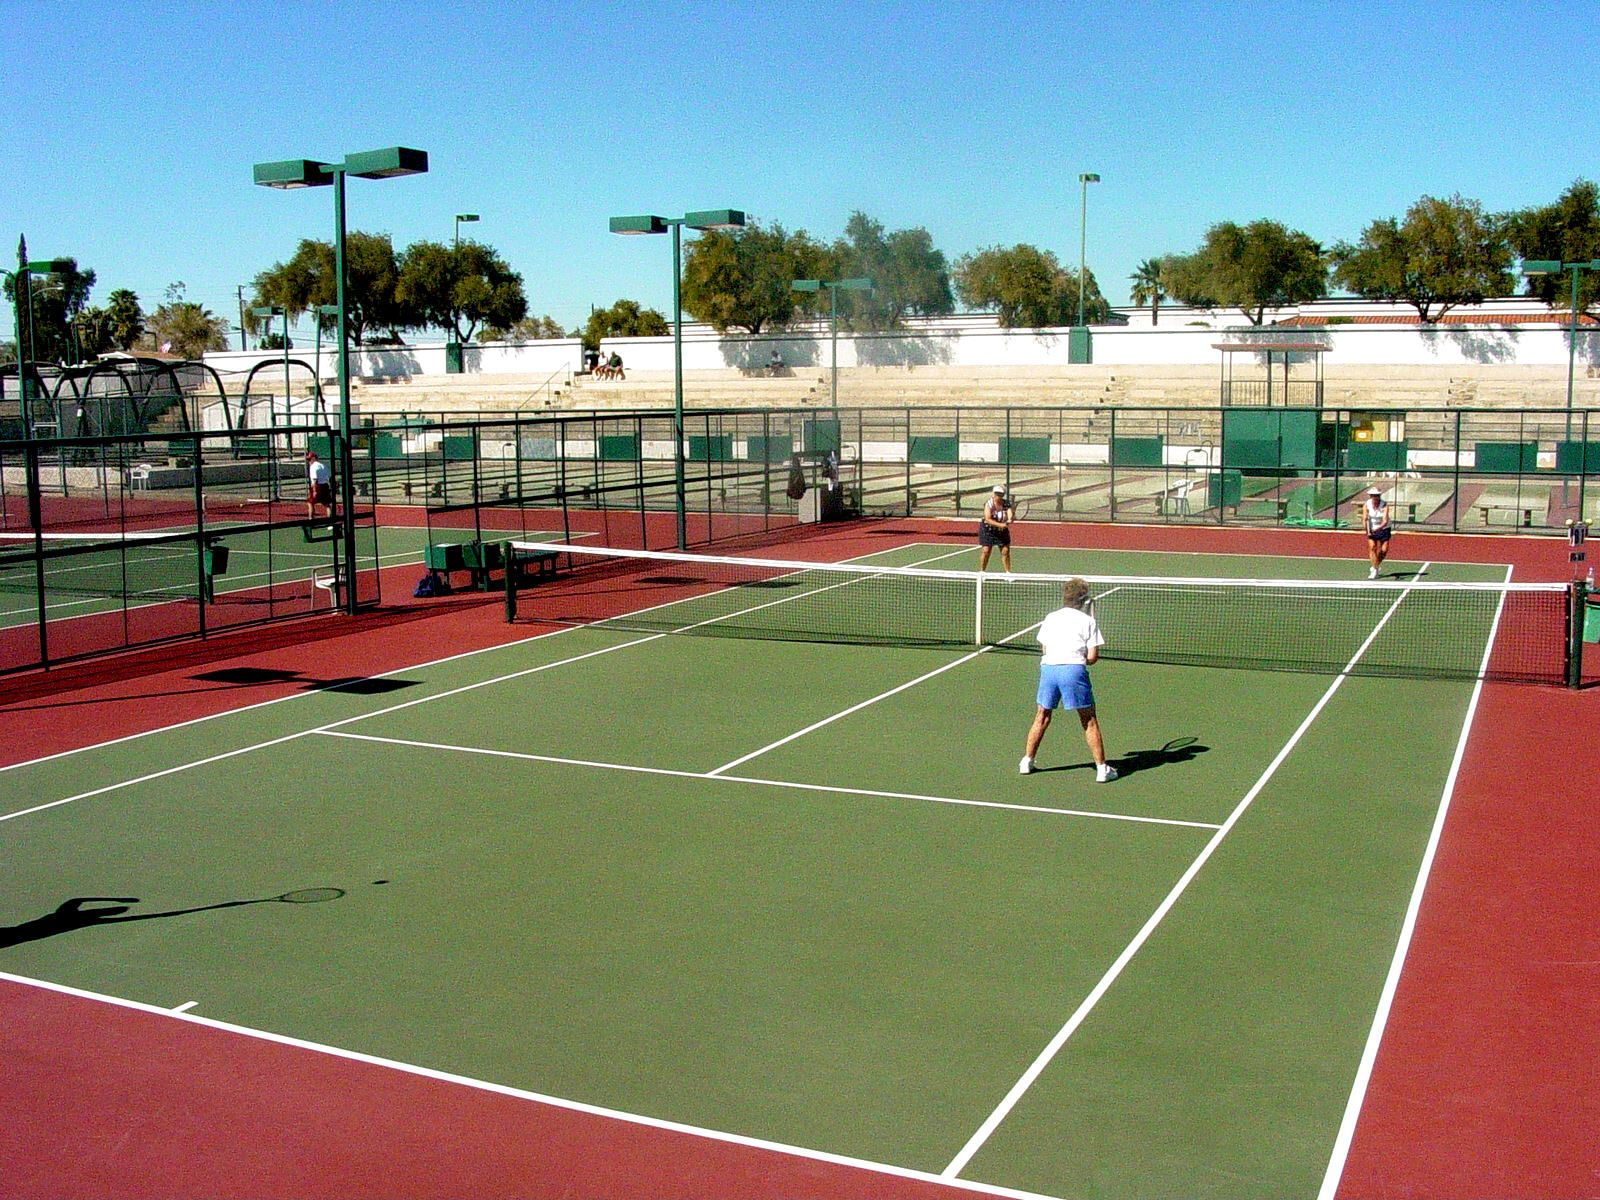 Mesa Regal Www Cal Am Com Resorts Our Resorts Tennis